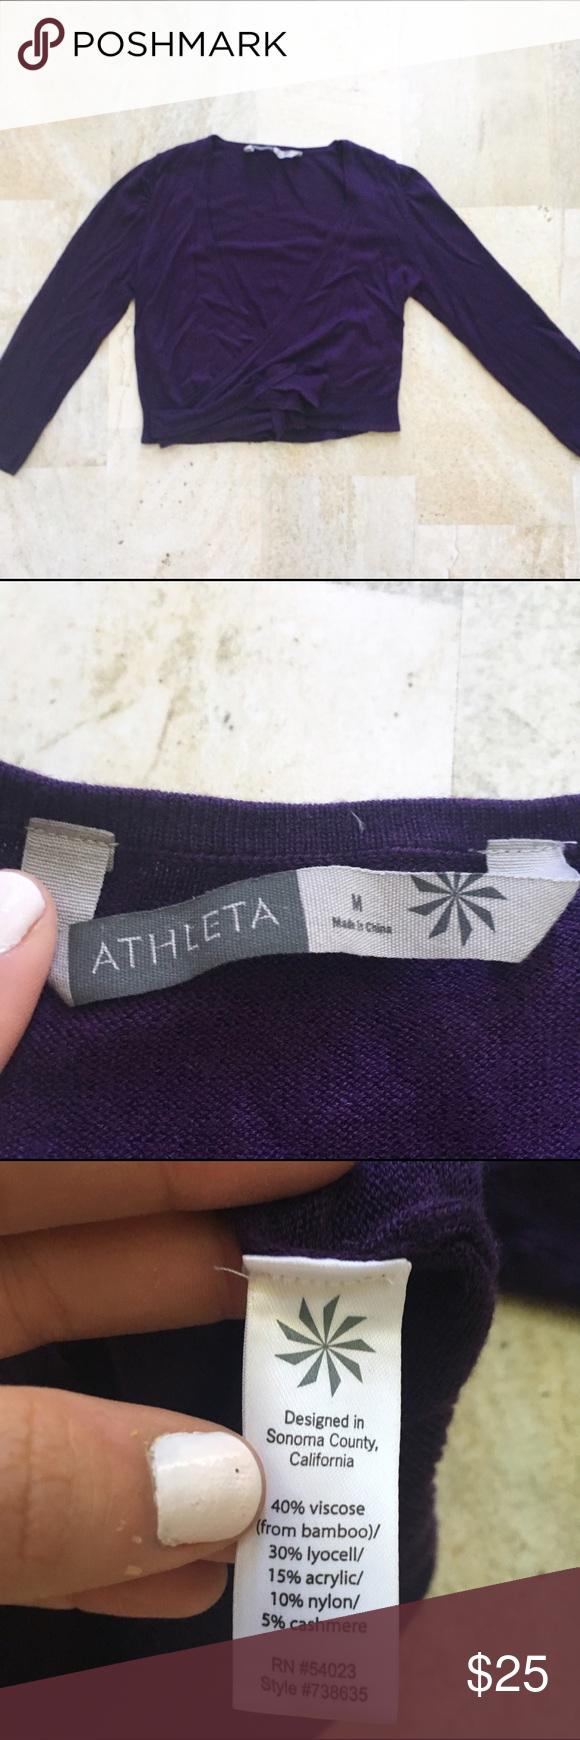 Athleta Purple Wrap Cardigan | Short sleeves, Sleeve and Cardigans